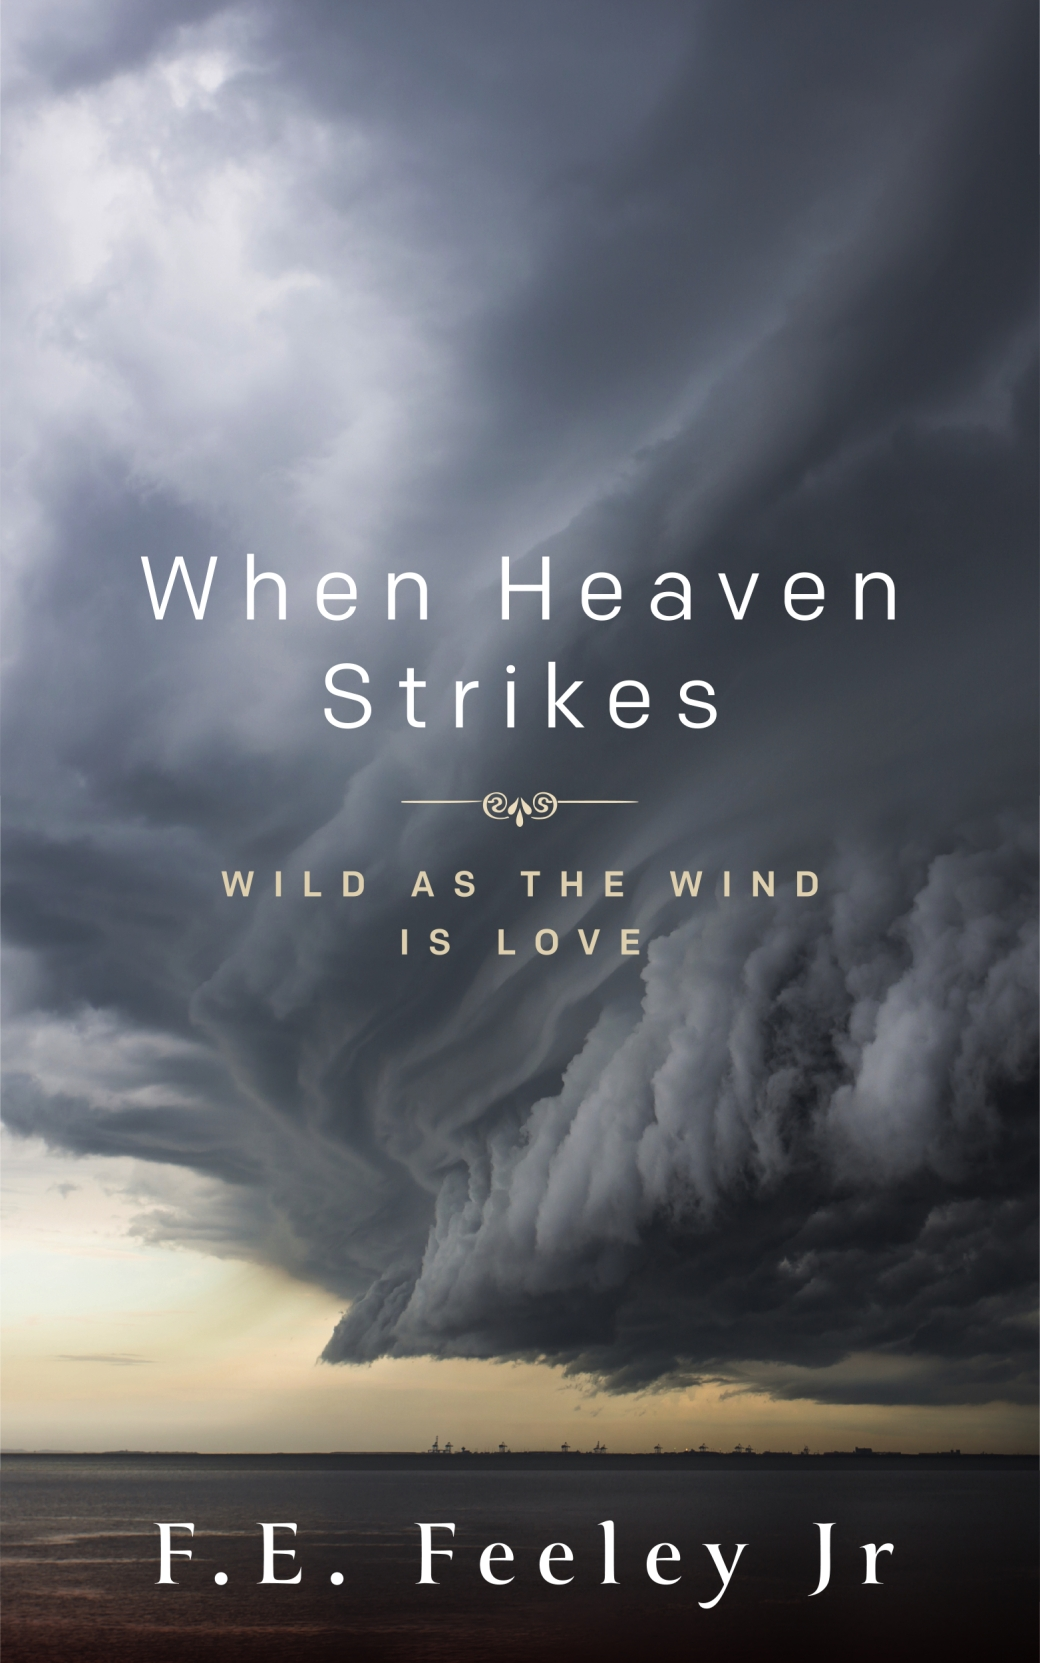 When Heaven Strikes - High Resolution (1)